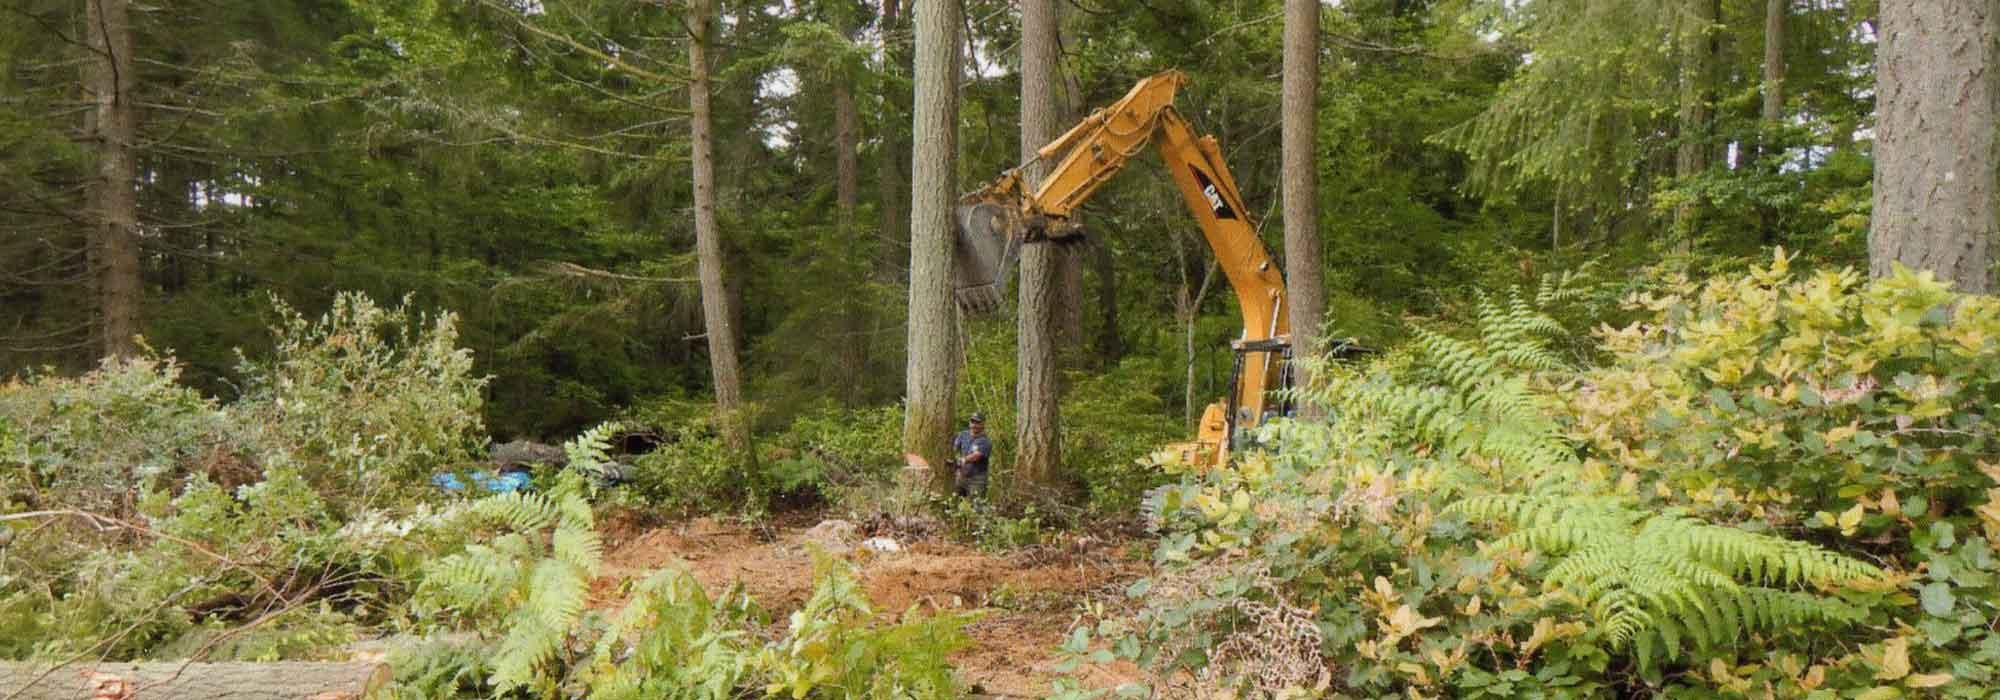 L & L Excavating & Landscaping Excavation Work